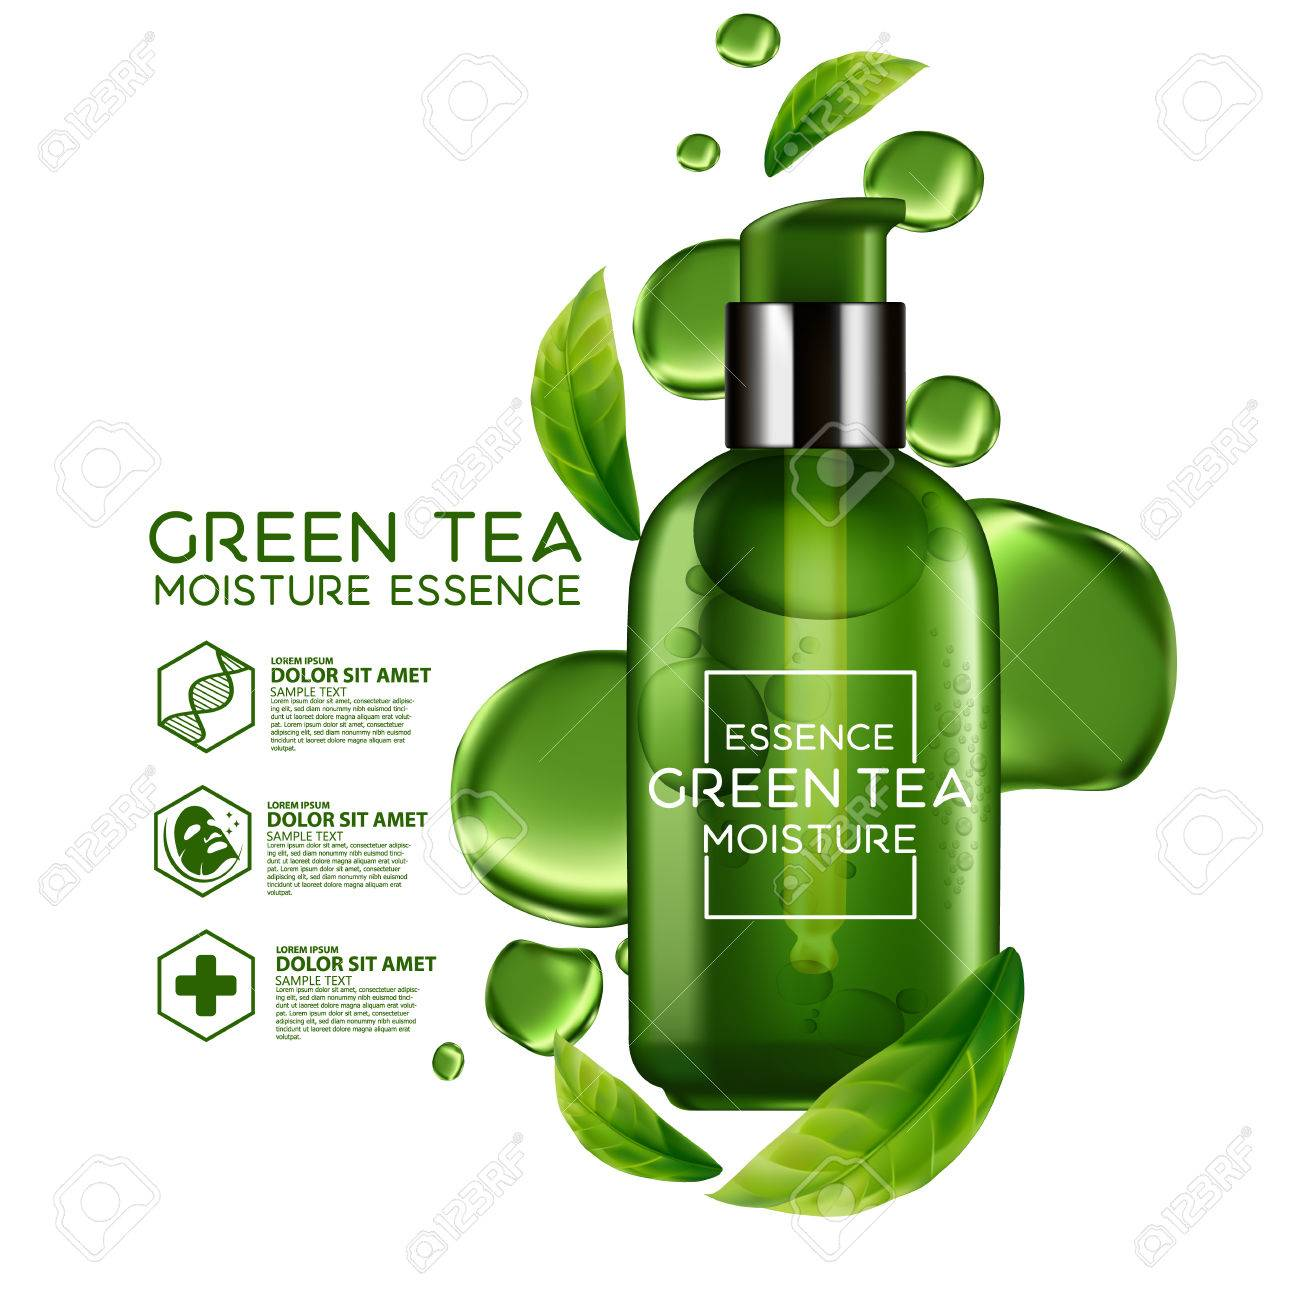 té verde para hidratar la piel